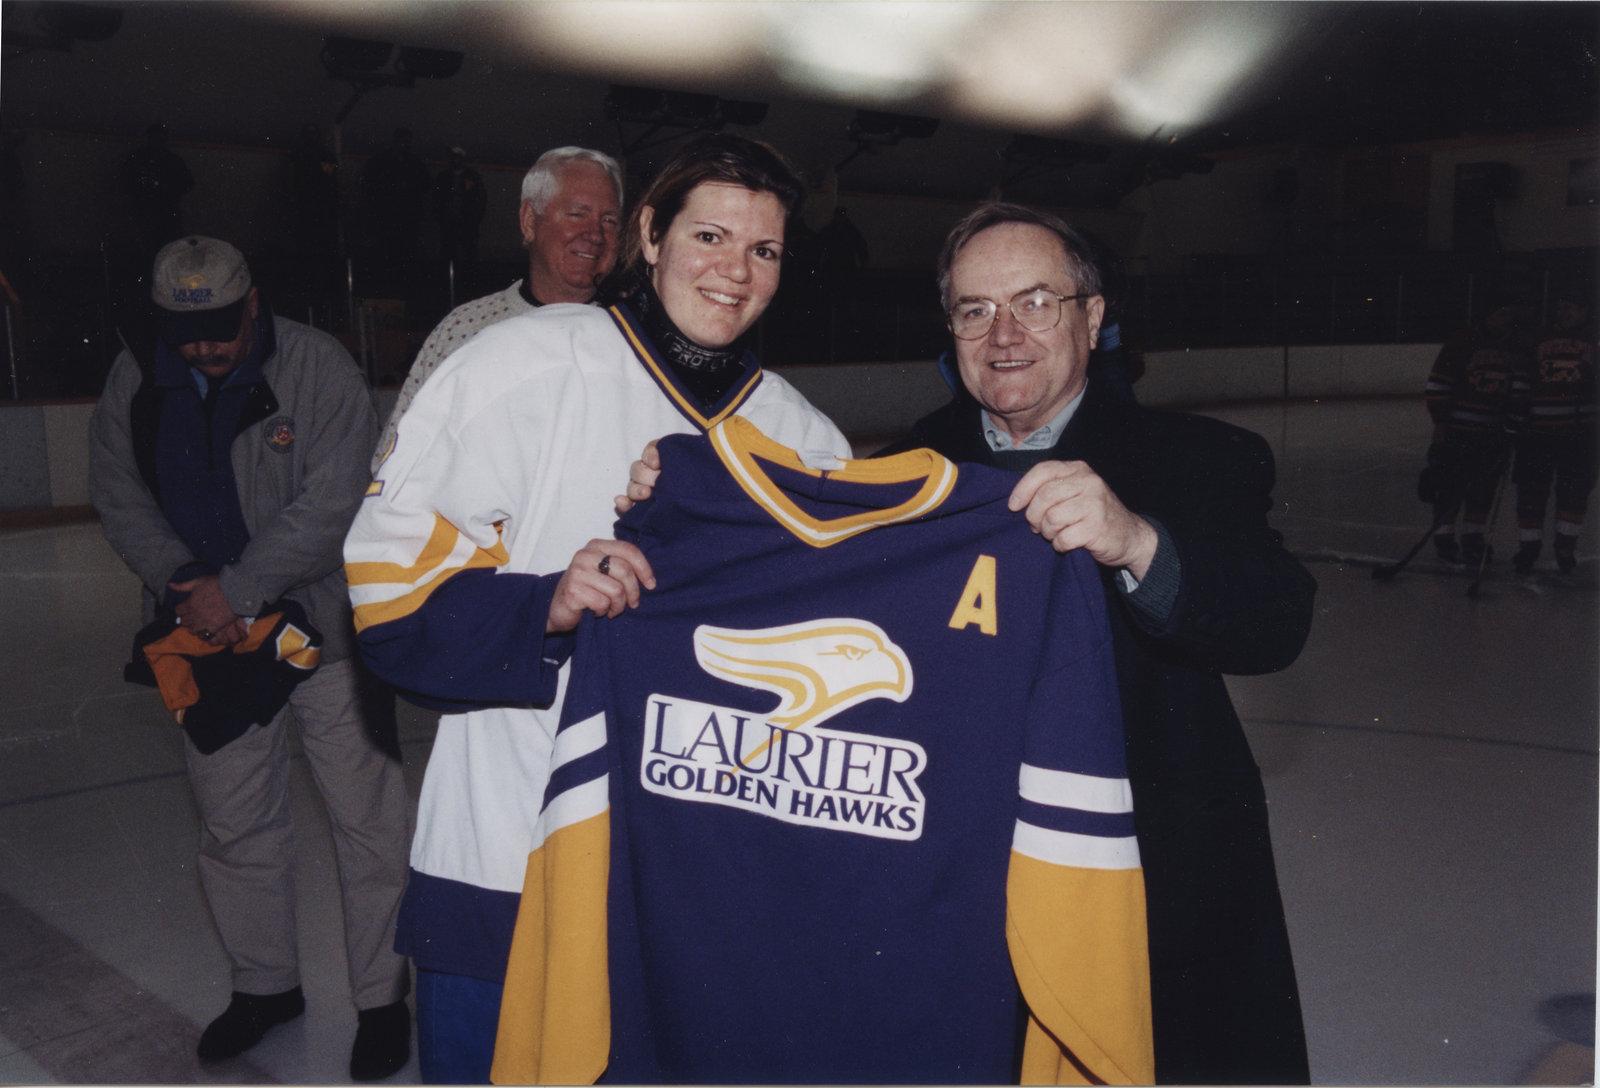 Marie Hahn and Robert Rosehart